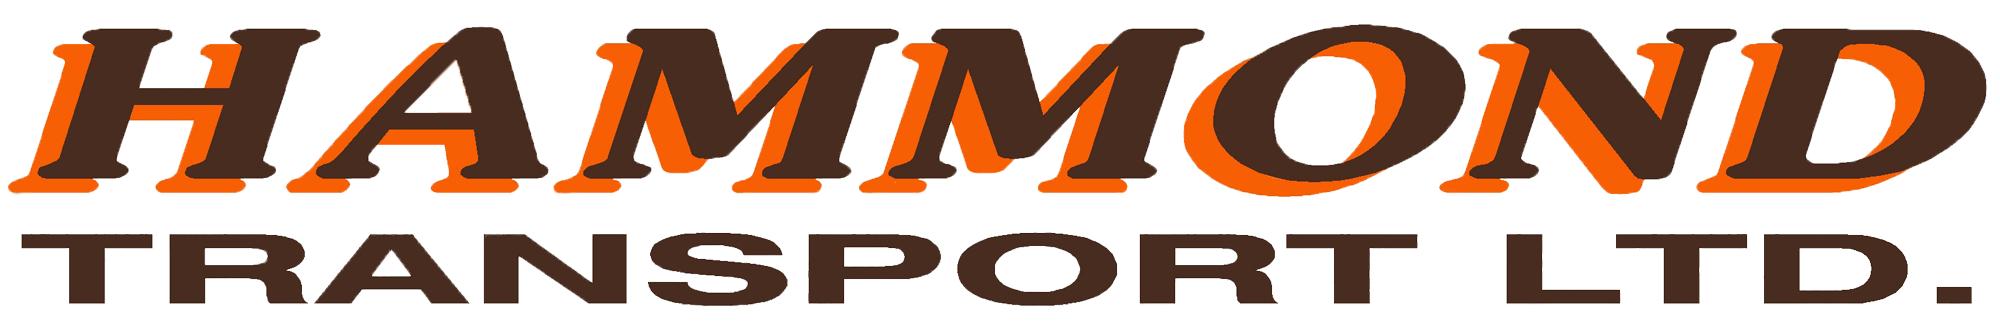 Hammond-Logo-transpo-new.png